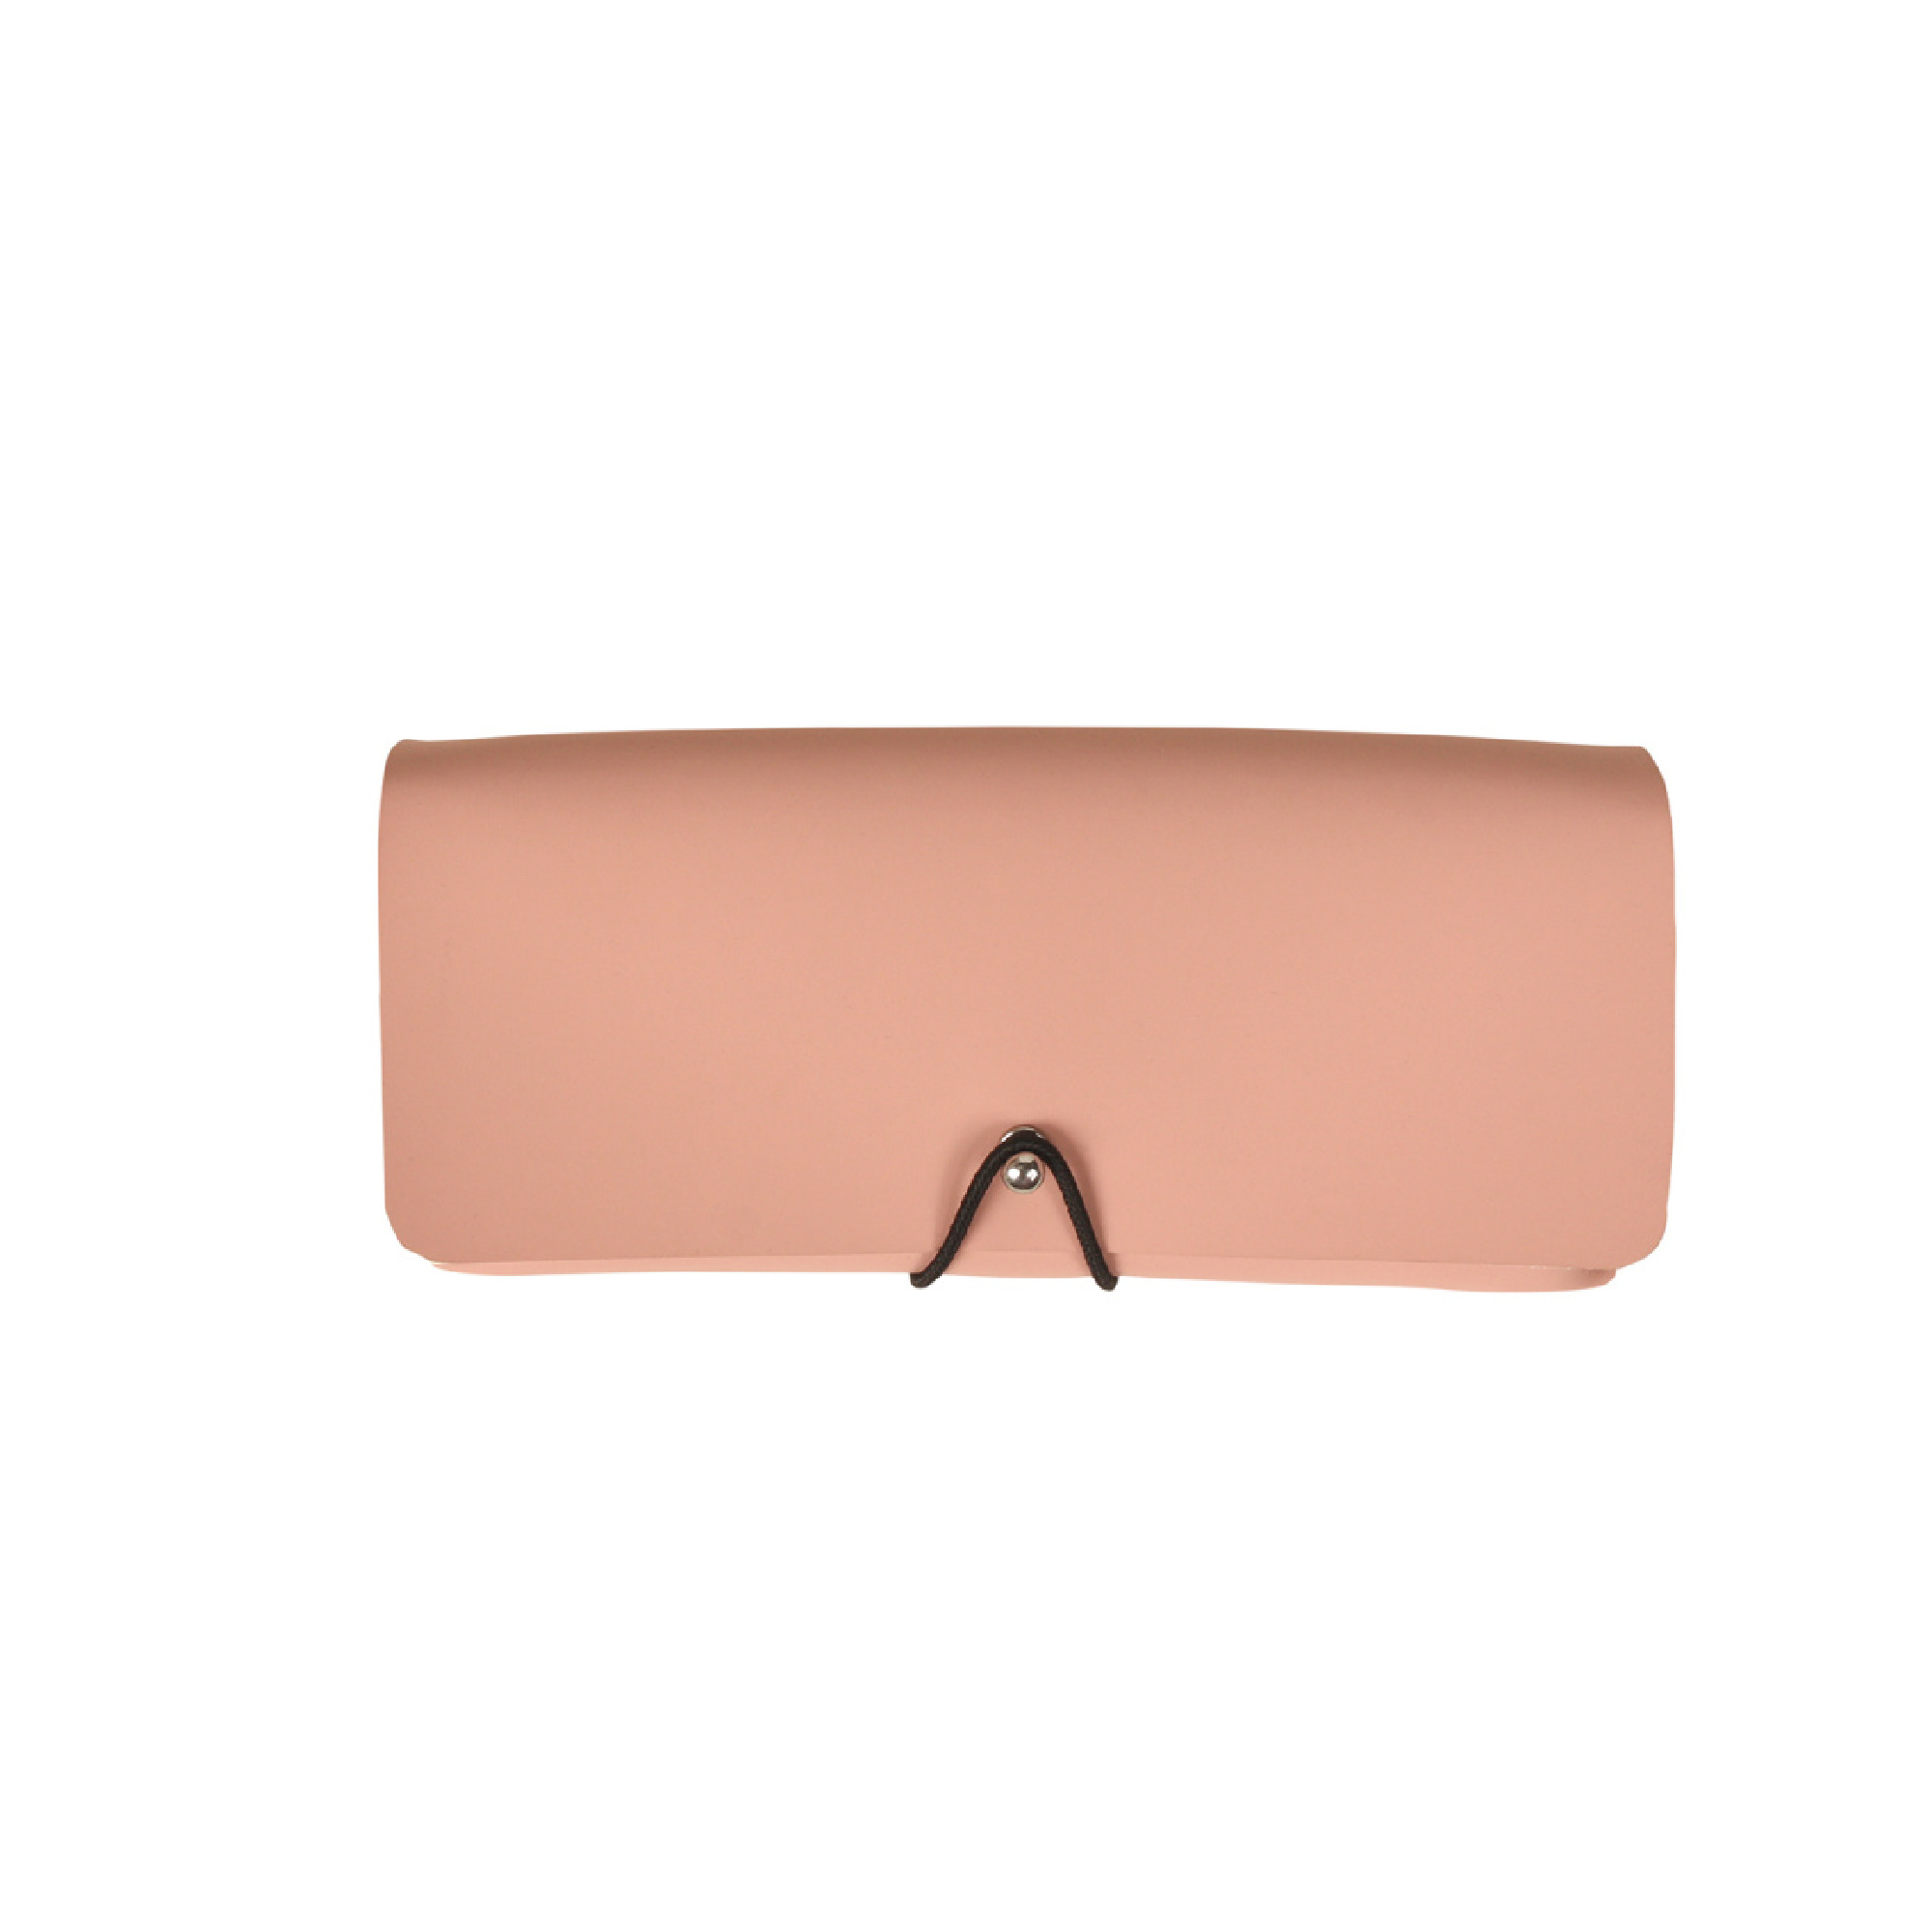 Newell Blush Sunglass Case